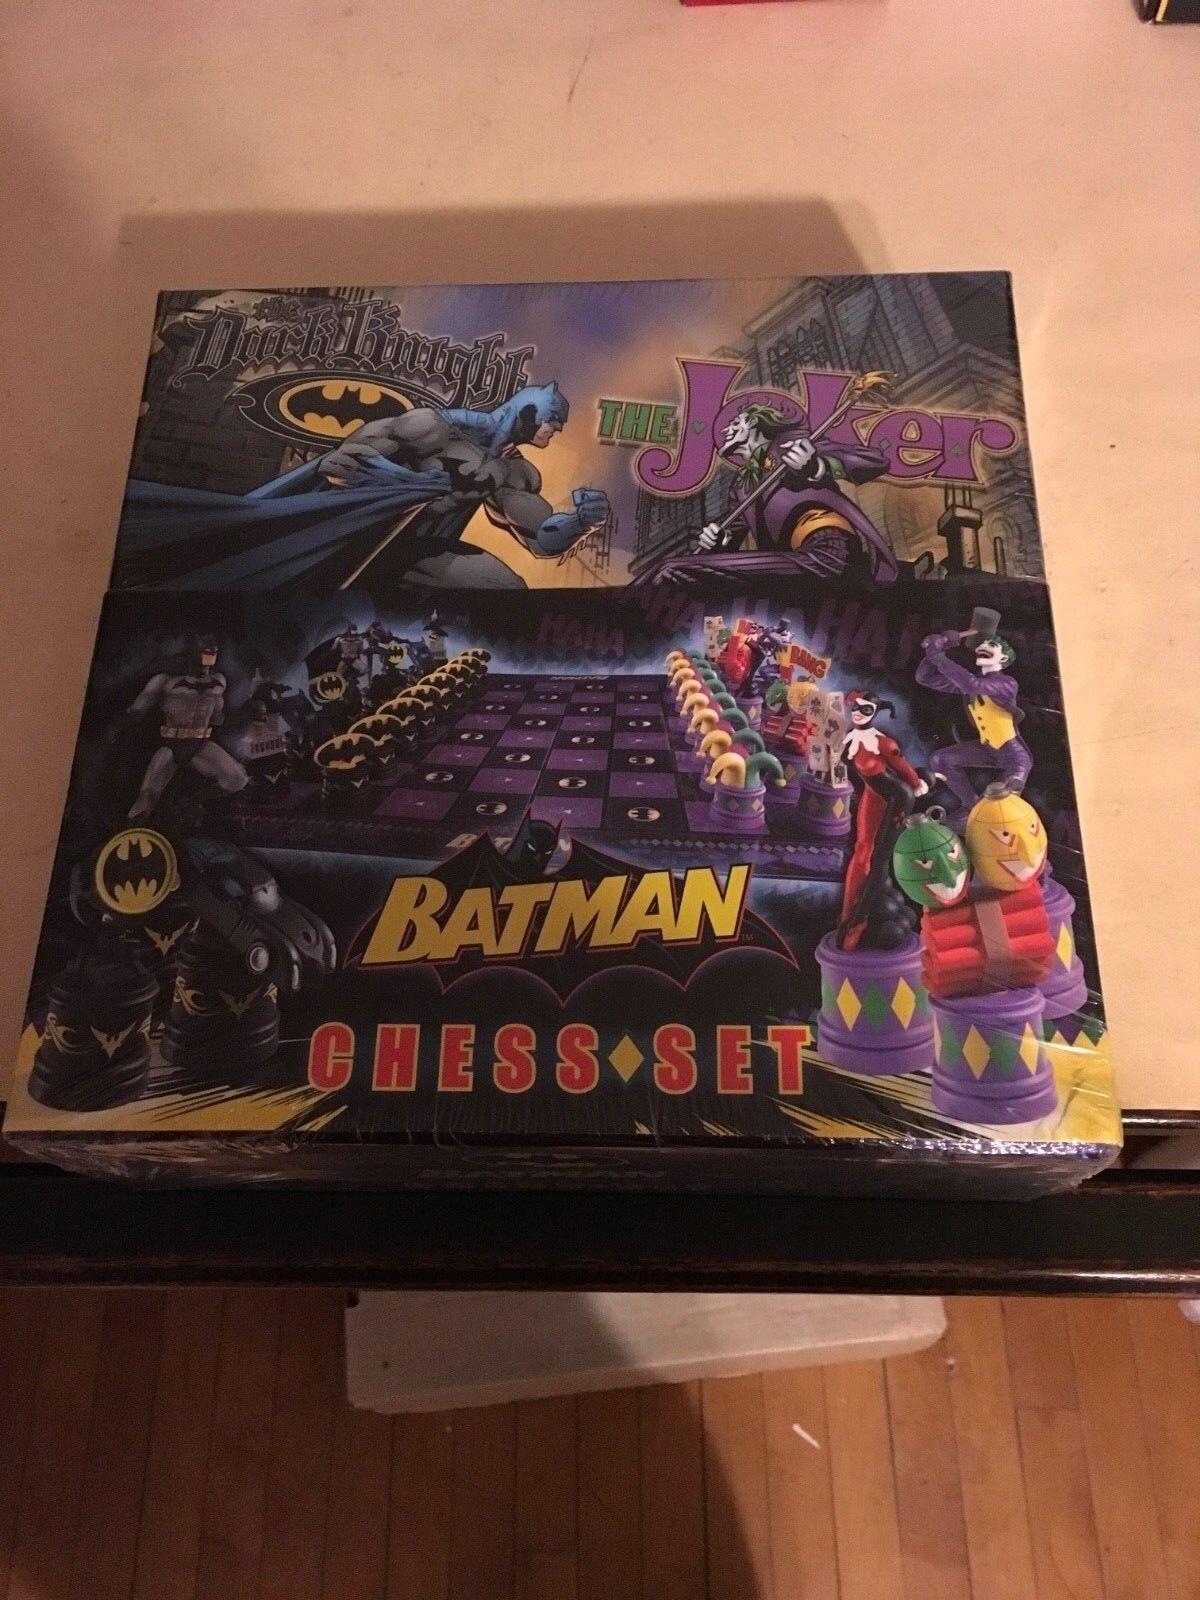 Batman chess set noble collection dark knight vs joker